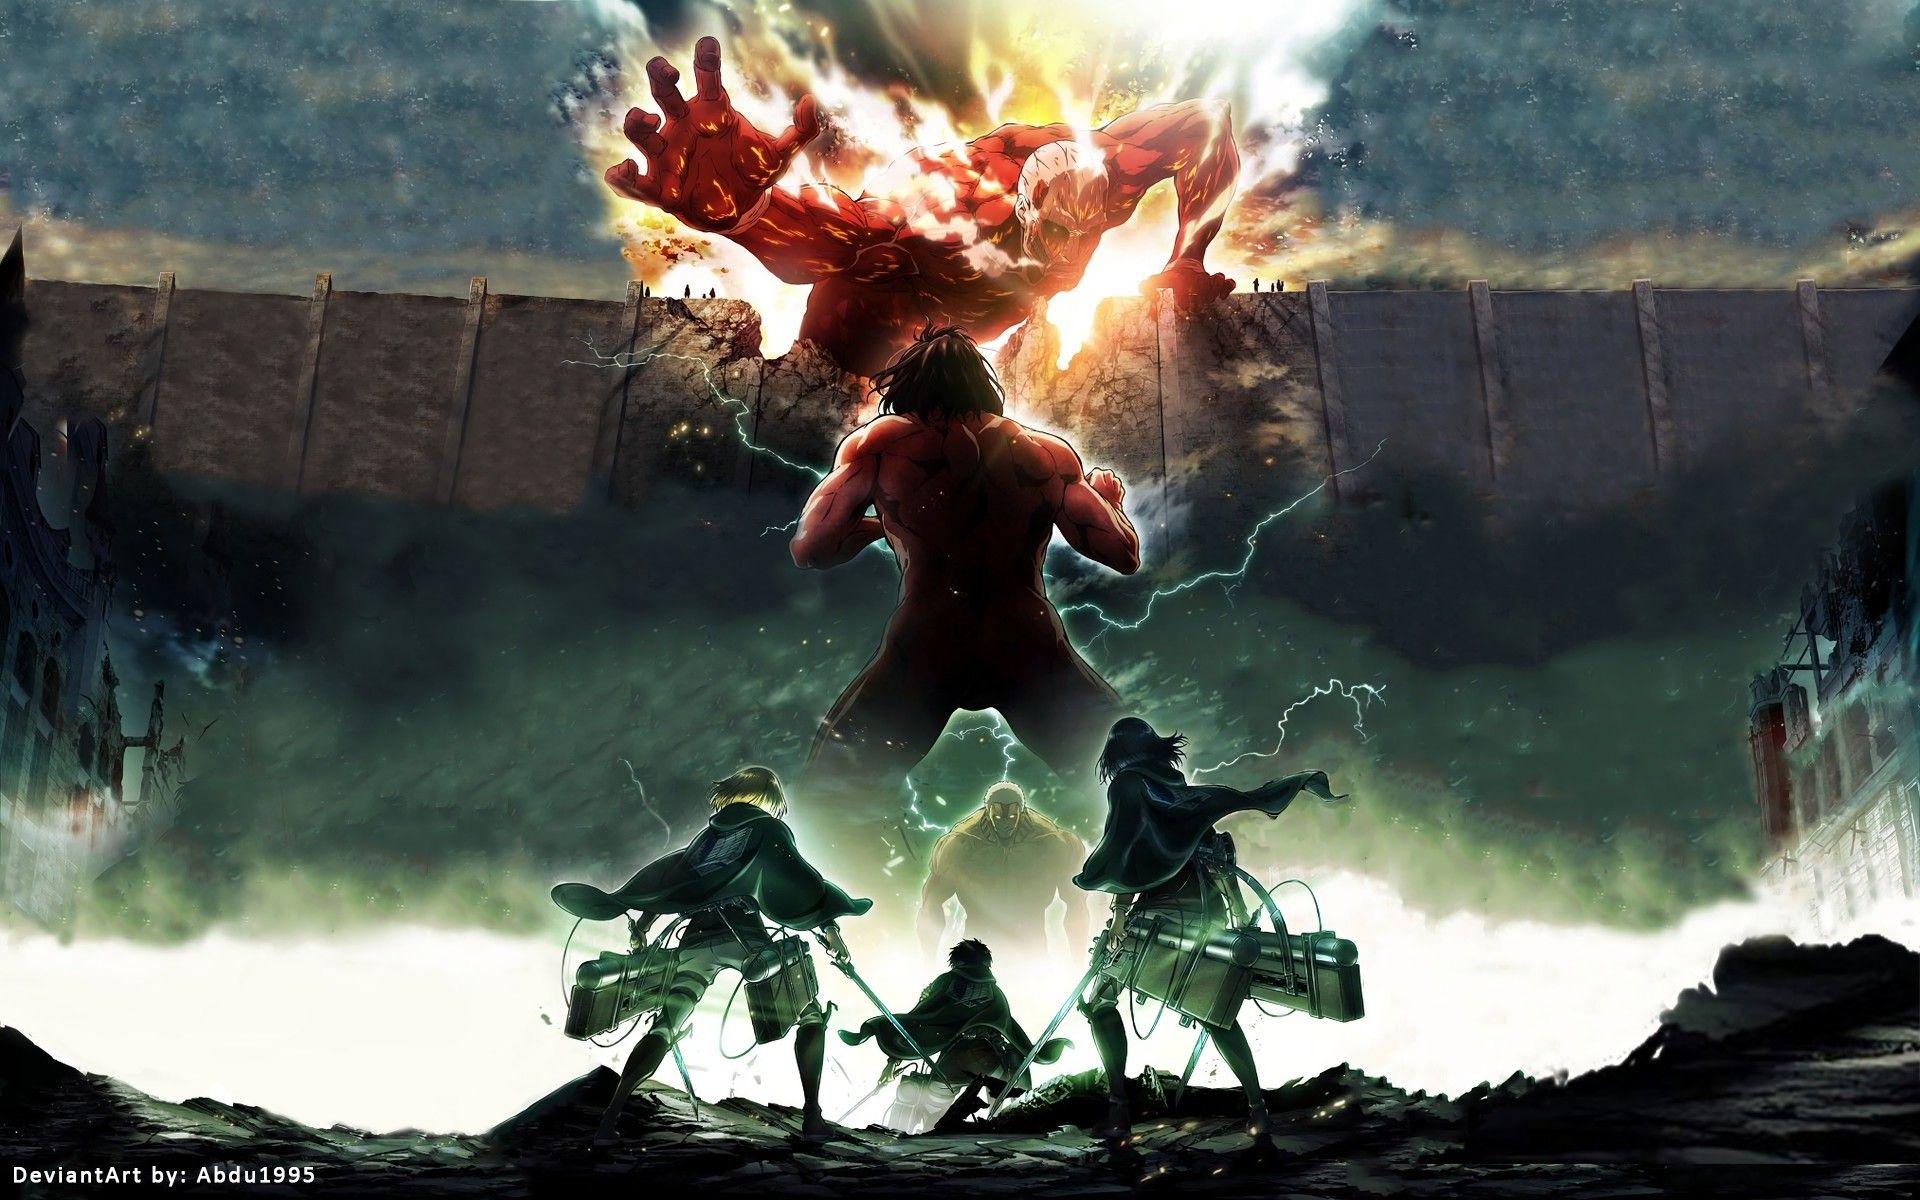 Res 1920x1200 Anime Attack On Titan Mikasa Ackerman Eren Yeager Armin Arlert Shingeki No Kyojin Wallpap Titans Anime Attack On Titan Anime Attack On Titan